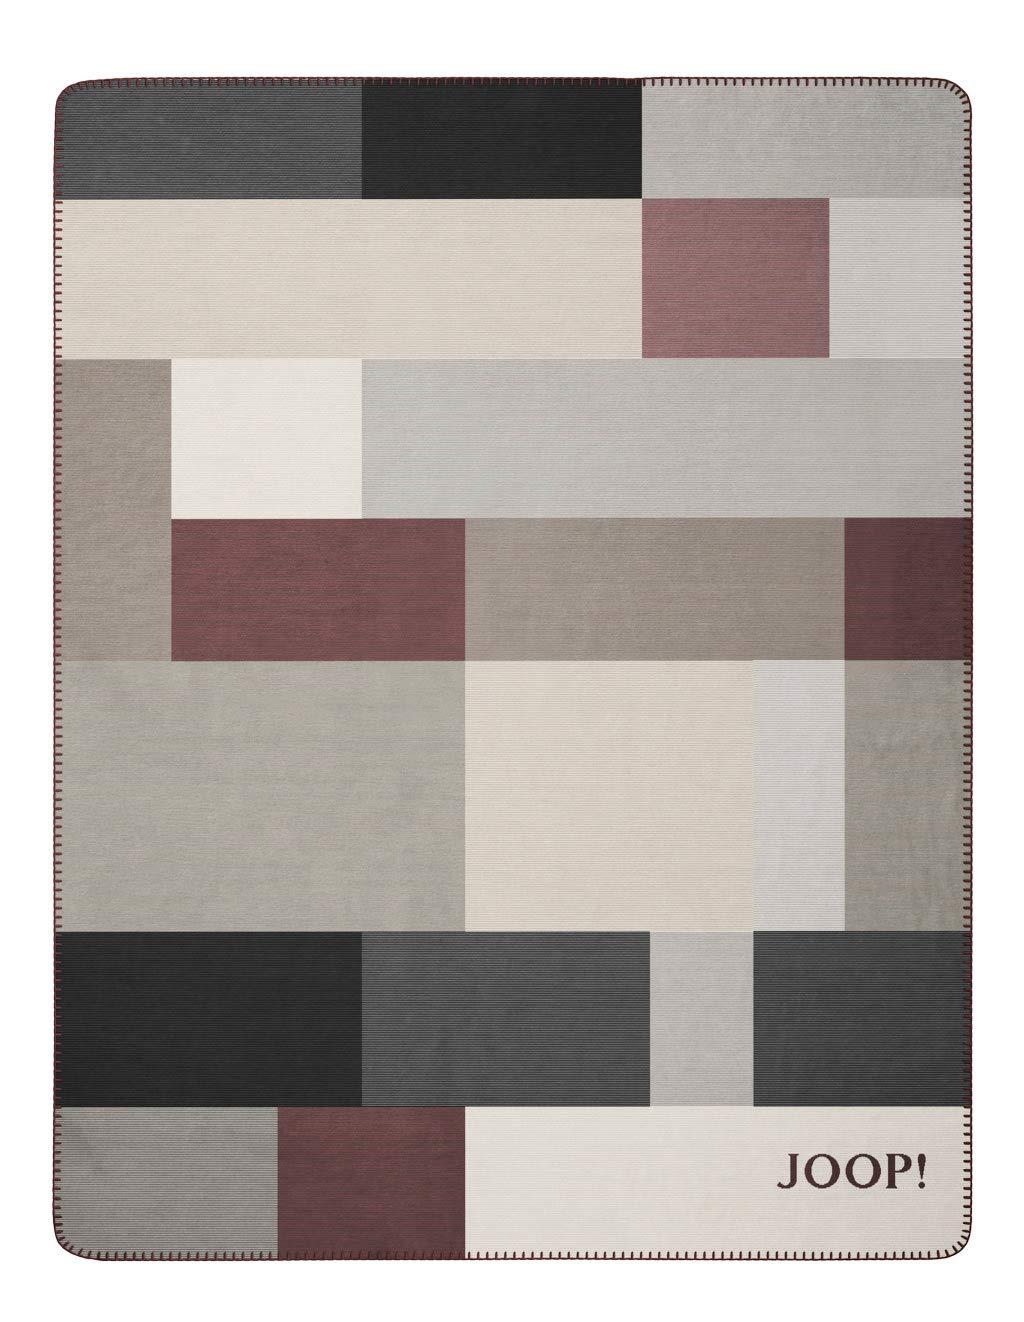 Joop  Wohdecke Bold 150x200 cm Farbe  Rouge-Sand